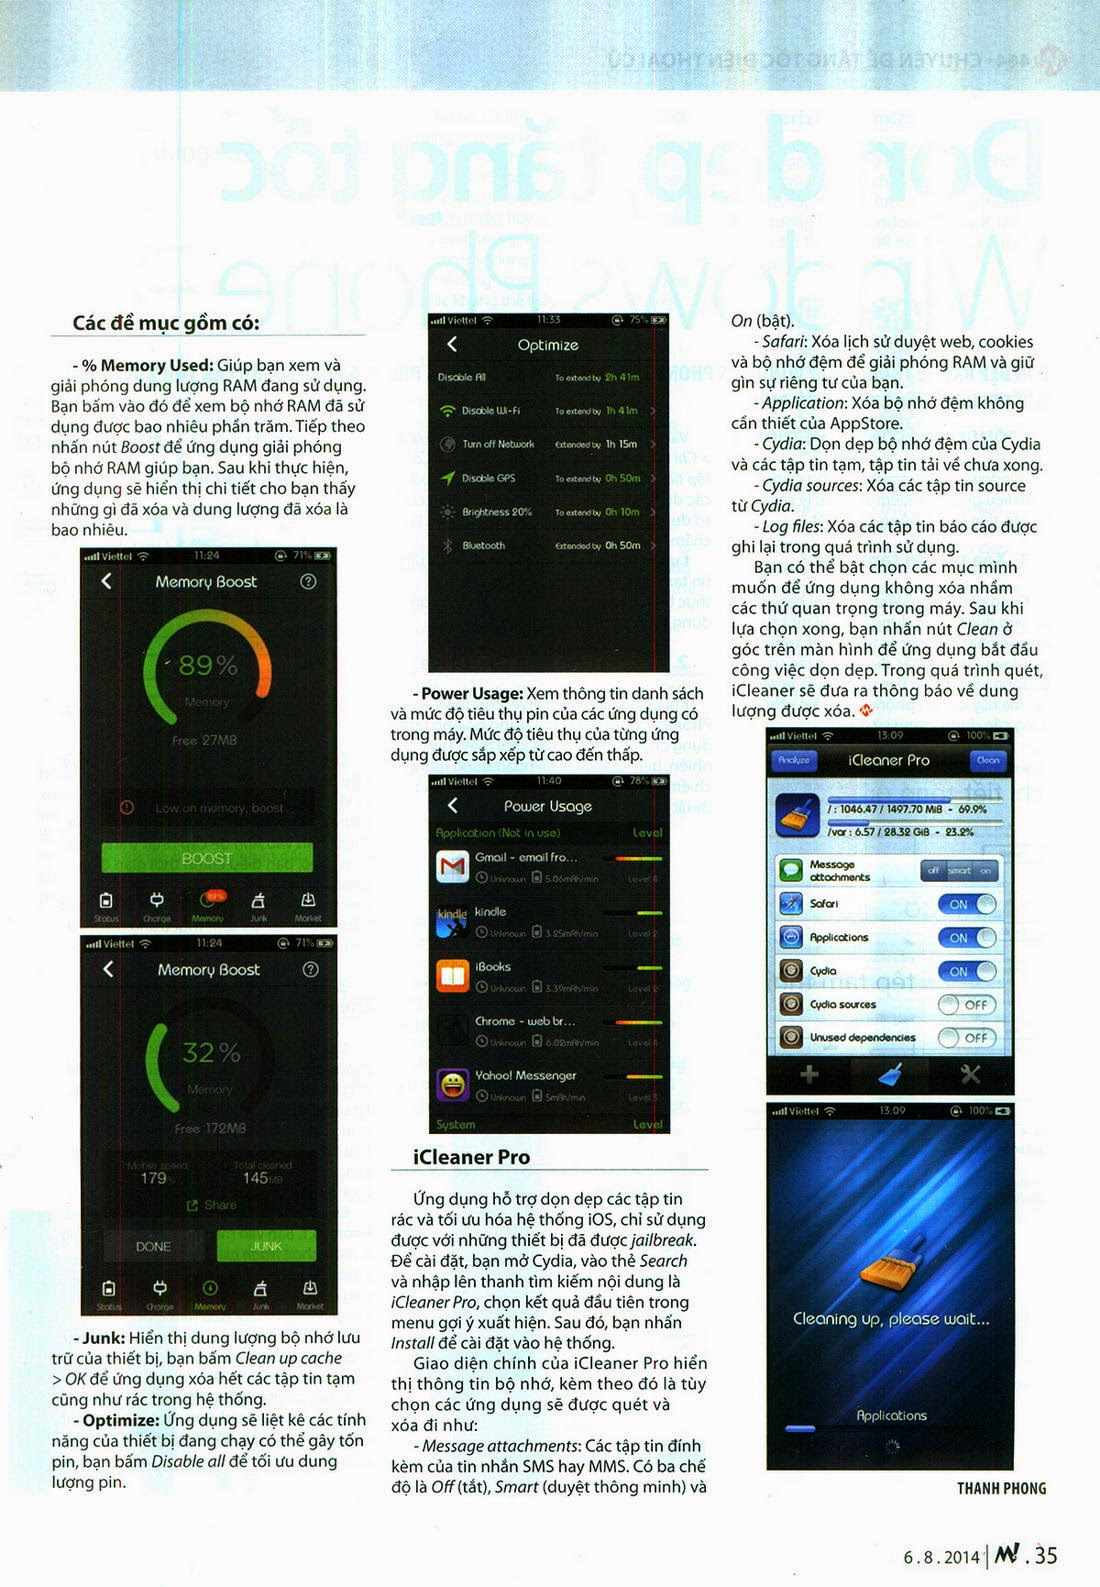 EChip Mobile 464 - tapchicntt.com